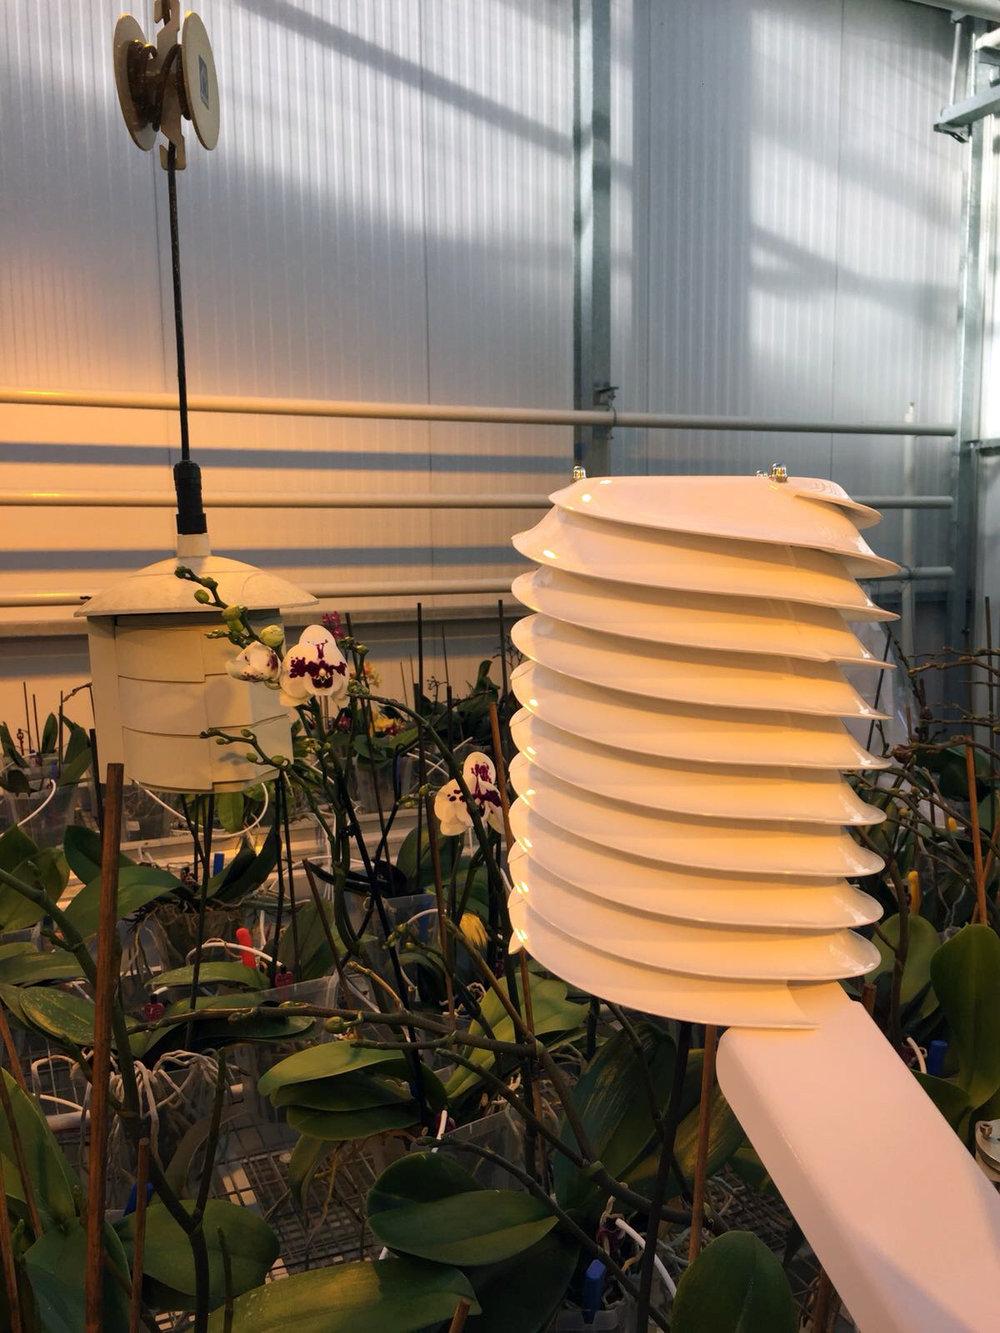 Bjorn 30Mhz Agro indoor farming.jpg